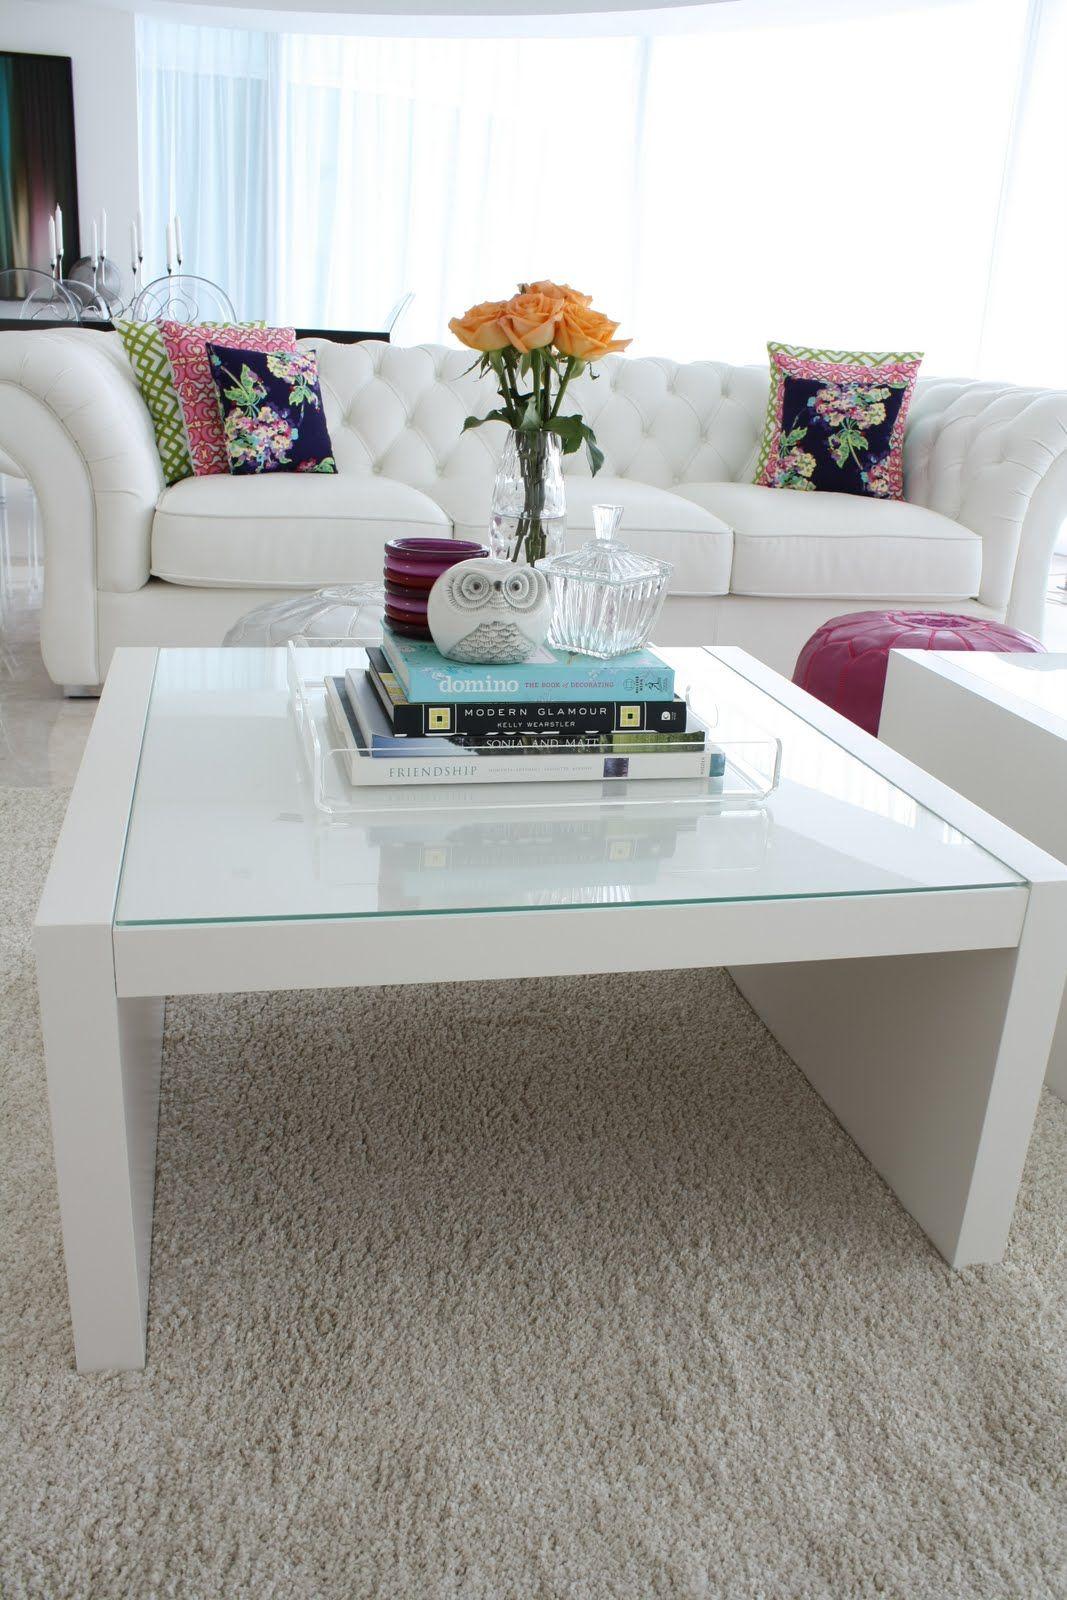 Madebygirl Sonja S High Rise Tour Via Made By Girl Modern Furniture Living Room Home Living Room Home [ 1600 x 1067 Pixel ]